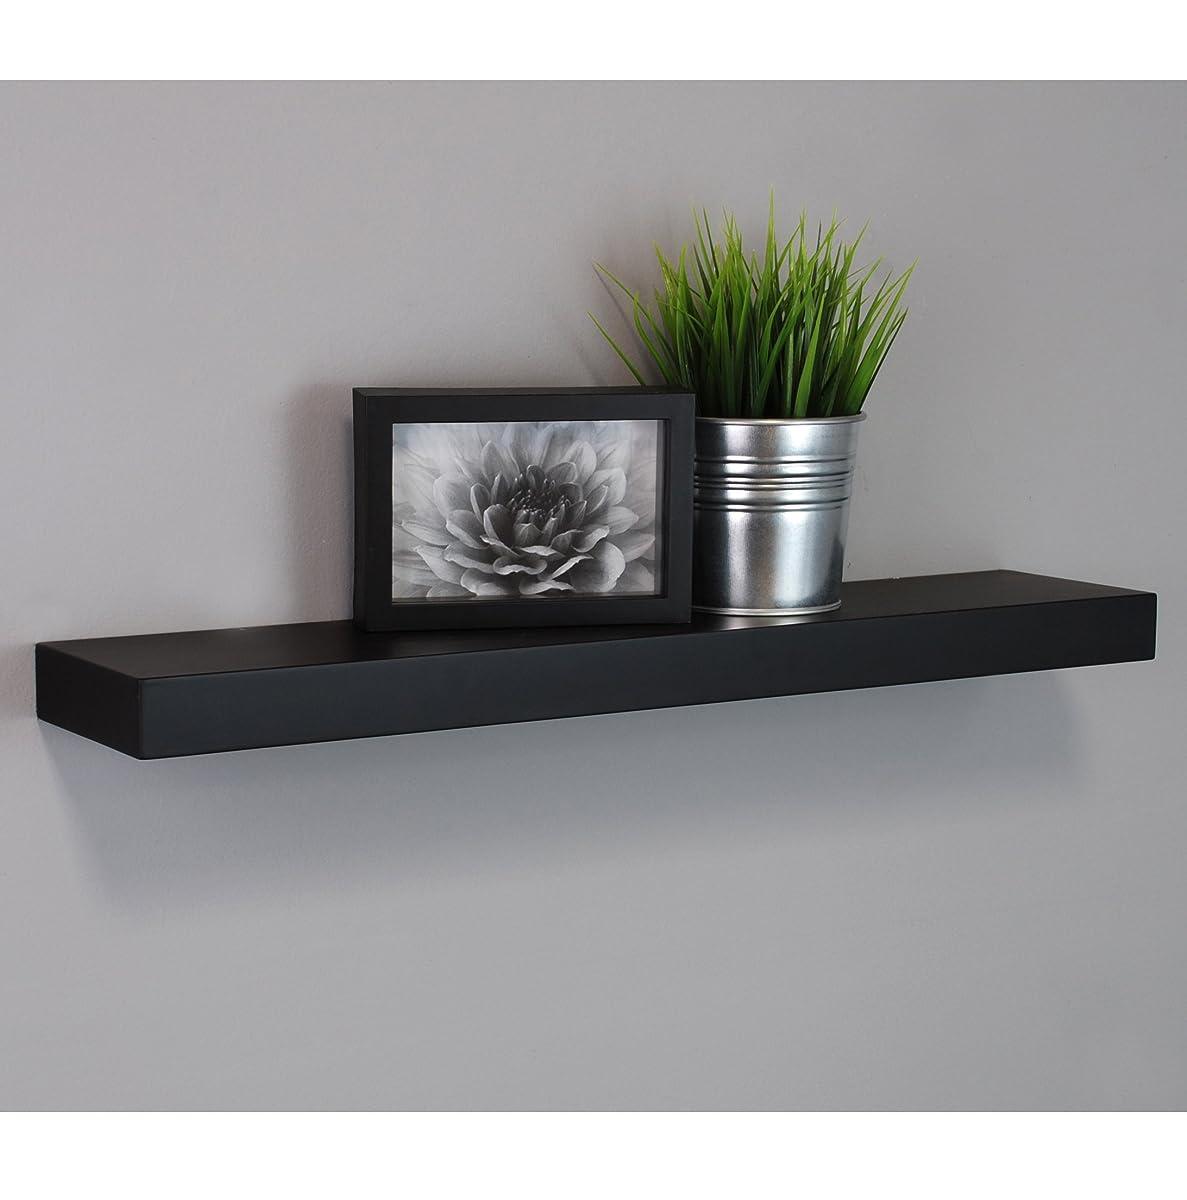 Kiera Grace Maine Wall Shelf/Floating Ledge, 24 Inch - Black